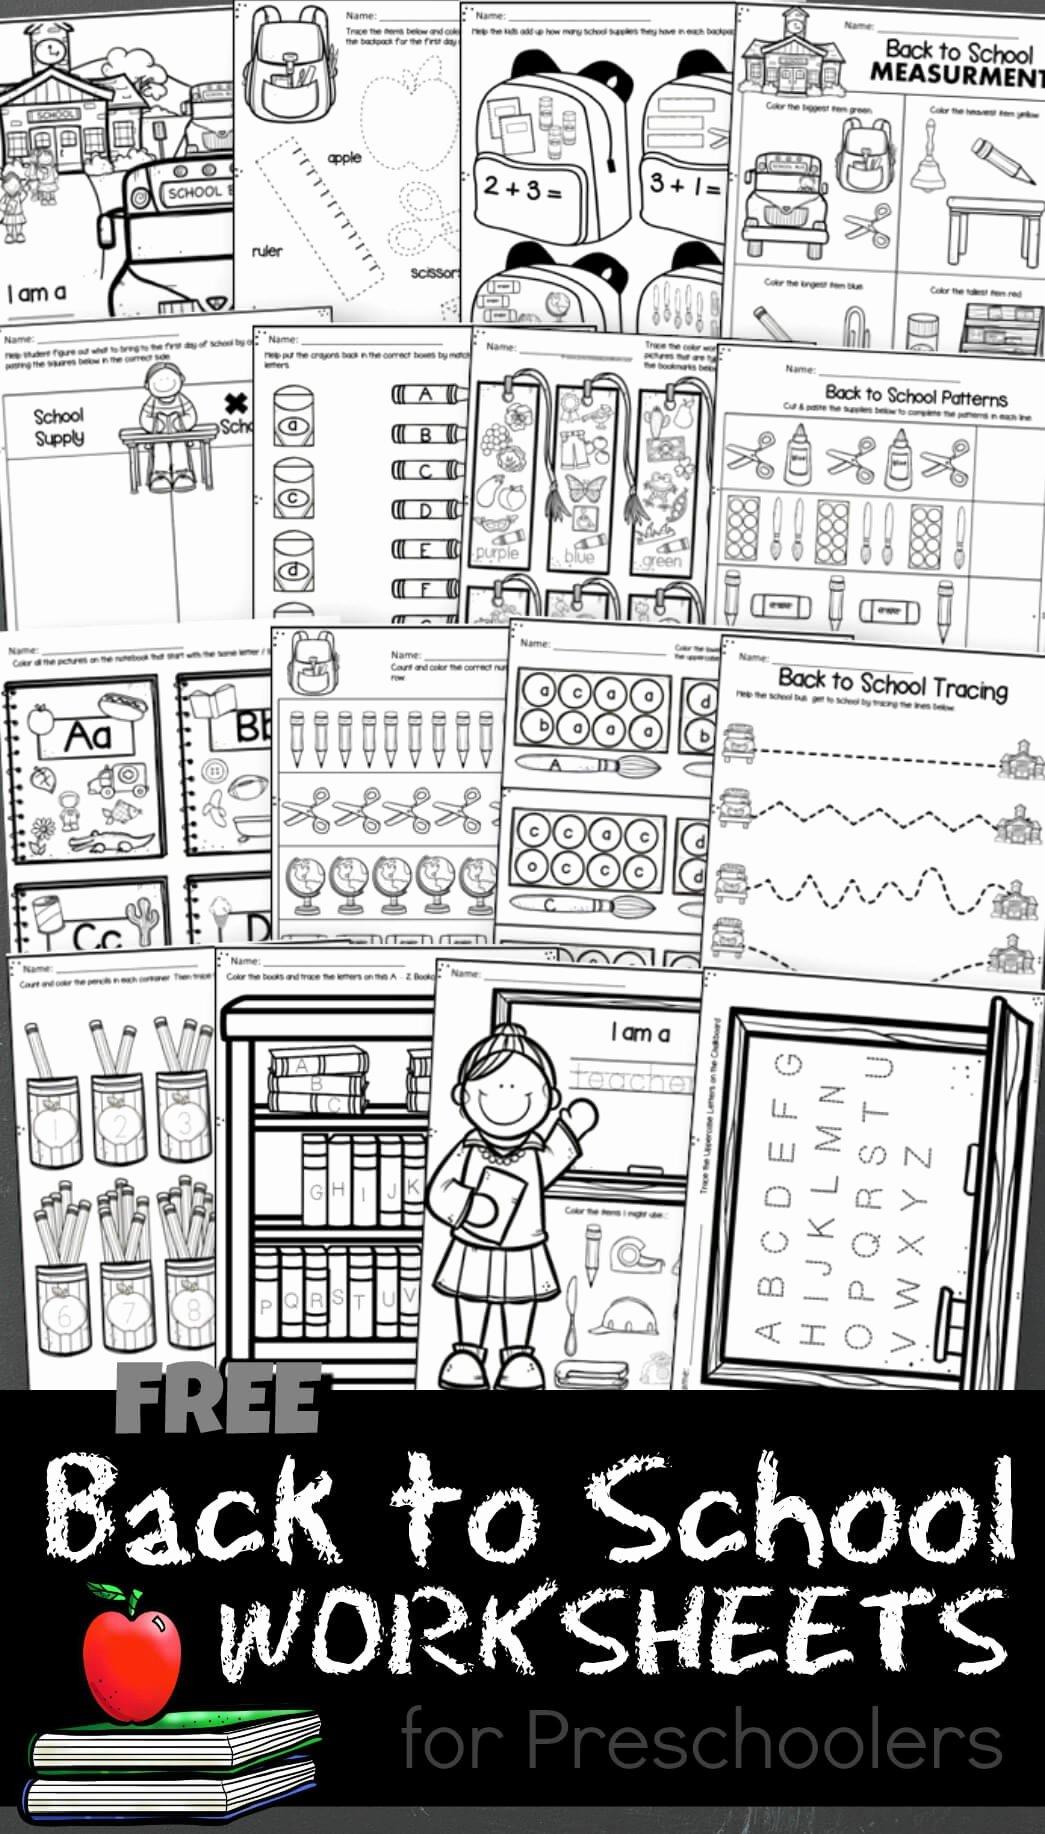 Back to School Worksheets for Preschoolers Ideas Free Back to School Worksheets